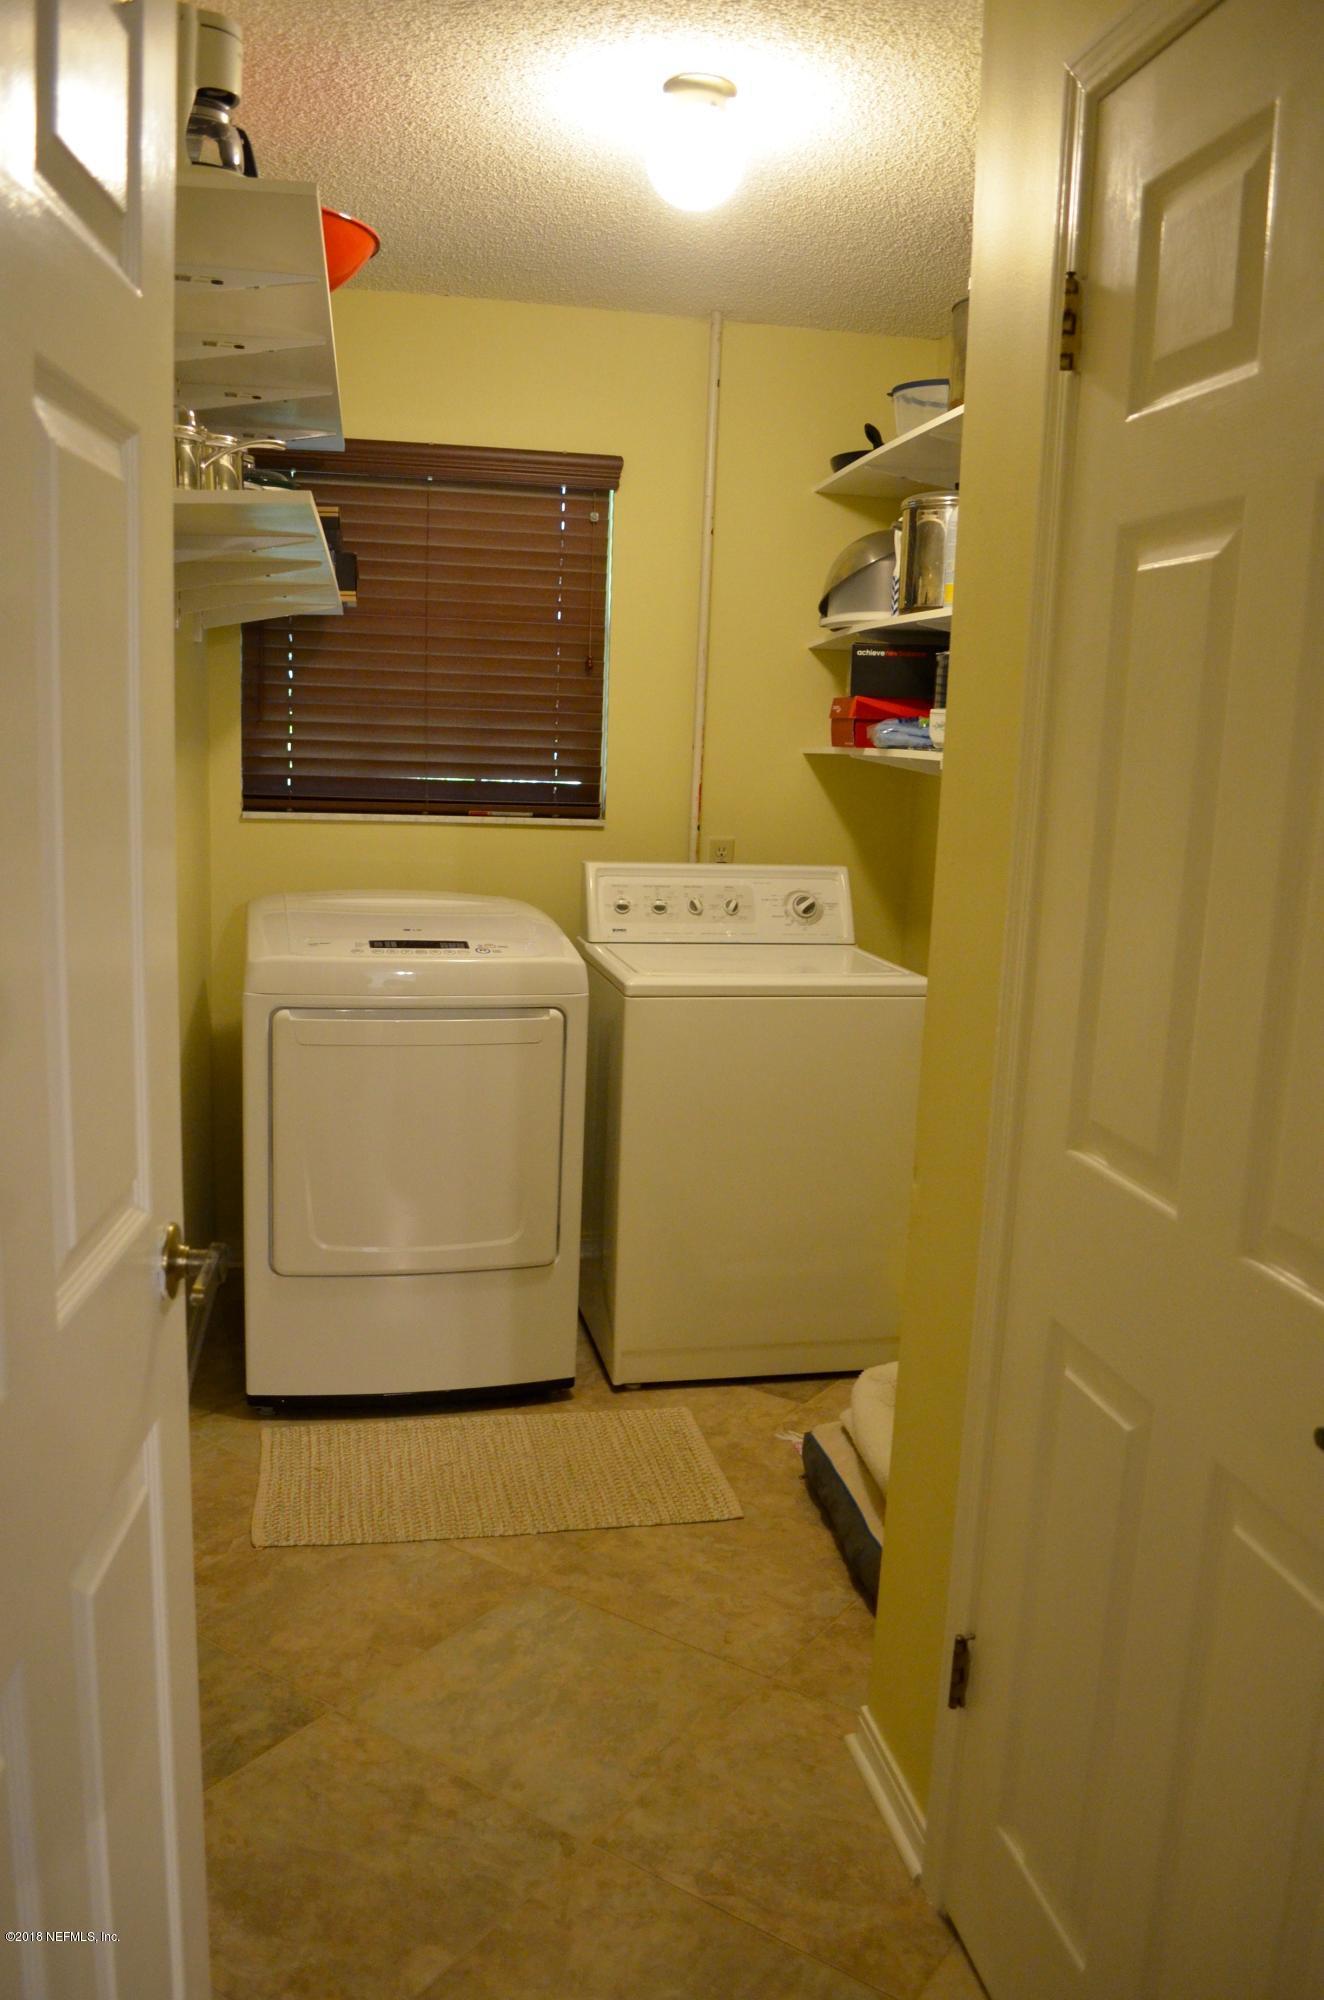 422 20TH, ATLANTIC BEACH, FLORIDA 32233, 4 Bedrooms Bedrooms, ,2 BathroomsBathrooms,Residential,For sale,20TH,1036686